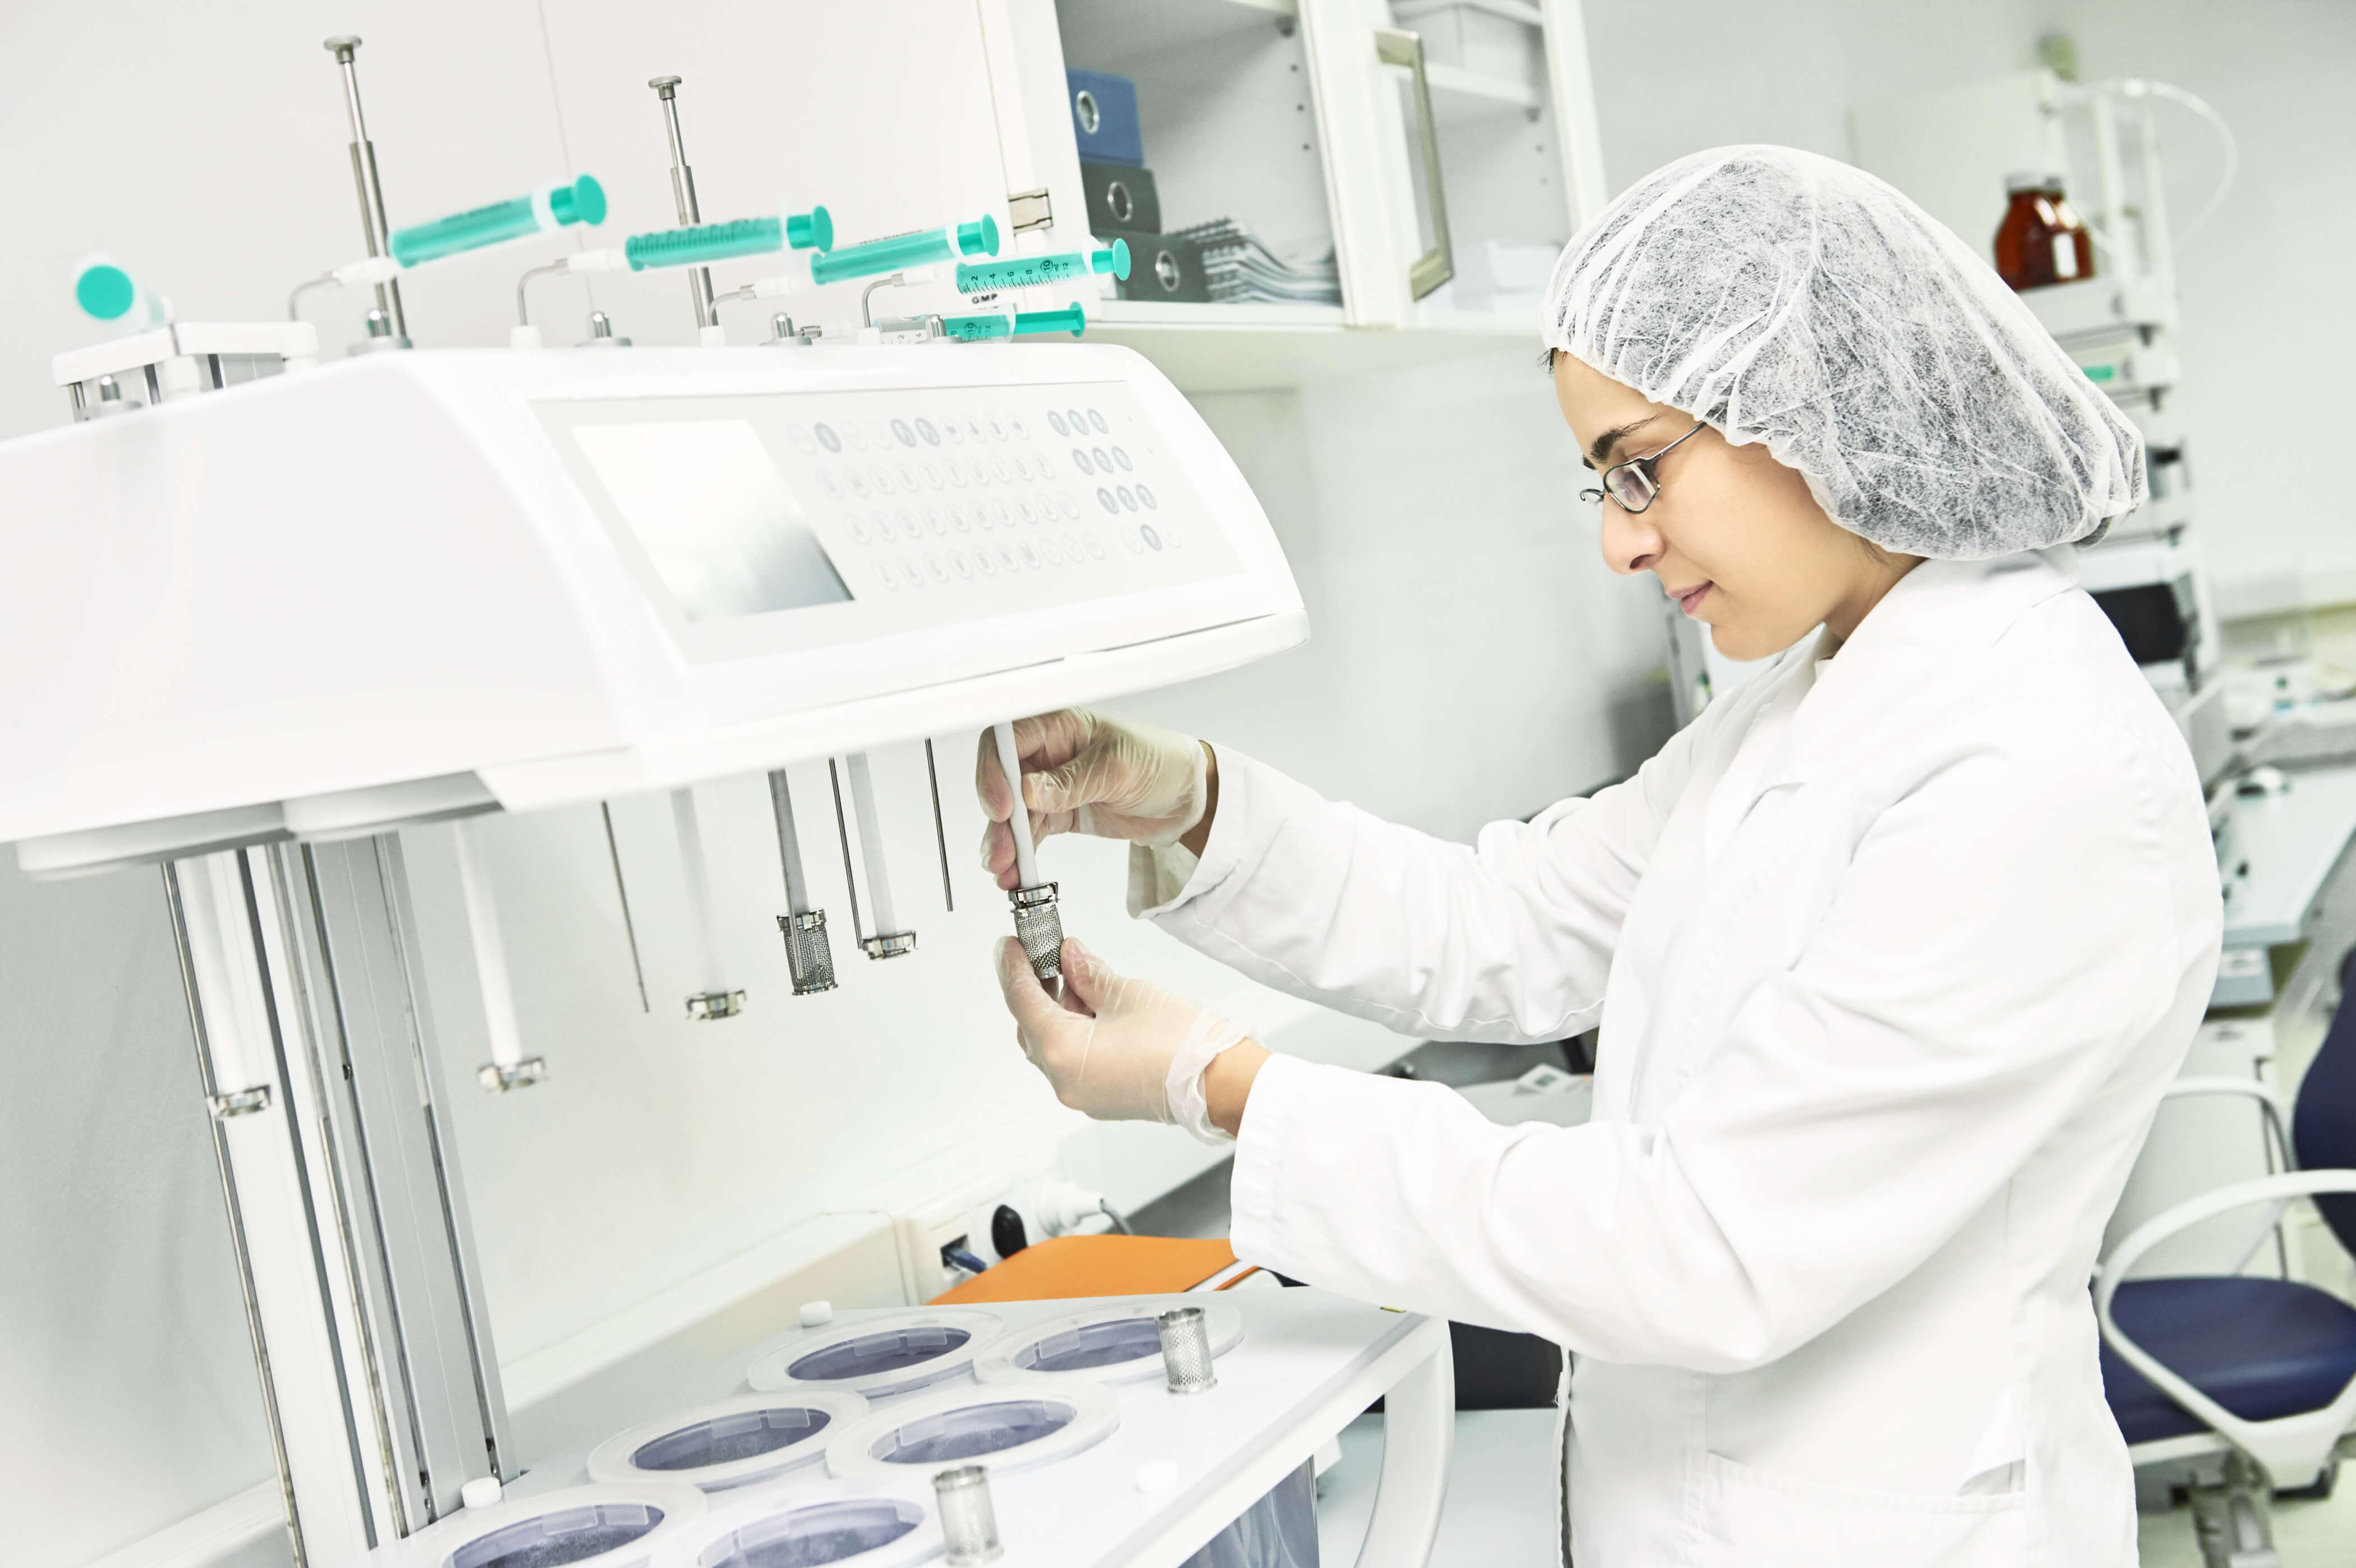 AIT Retains APS Accreditation for Pharmaceutical Sciences Degree